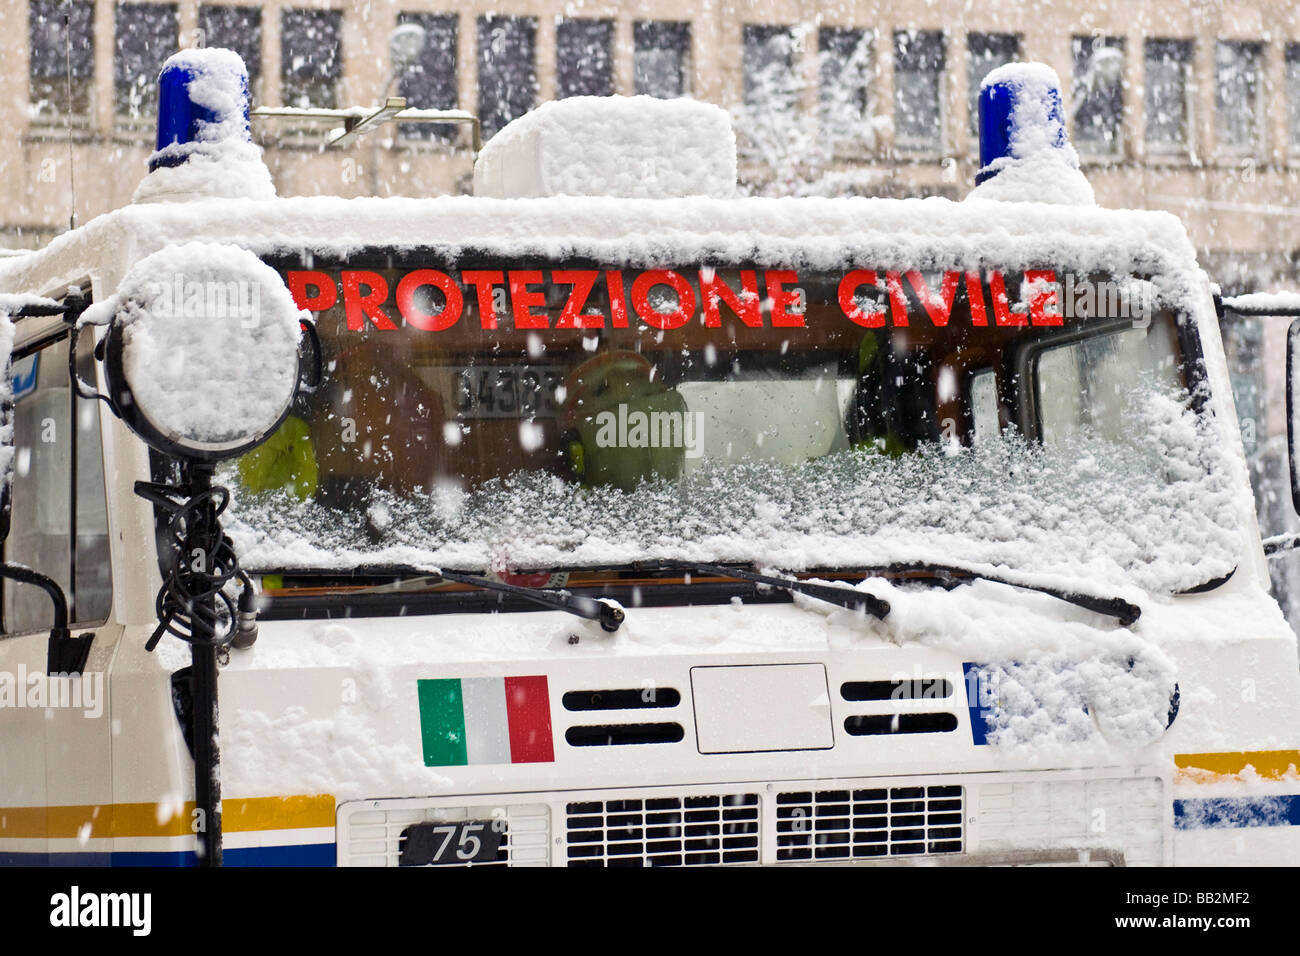 Vehicle of Civil Defense Busto Arsizio Province of Varese Italy - Stock Image